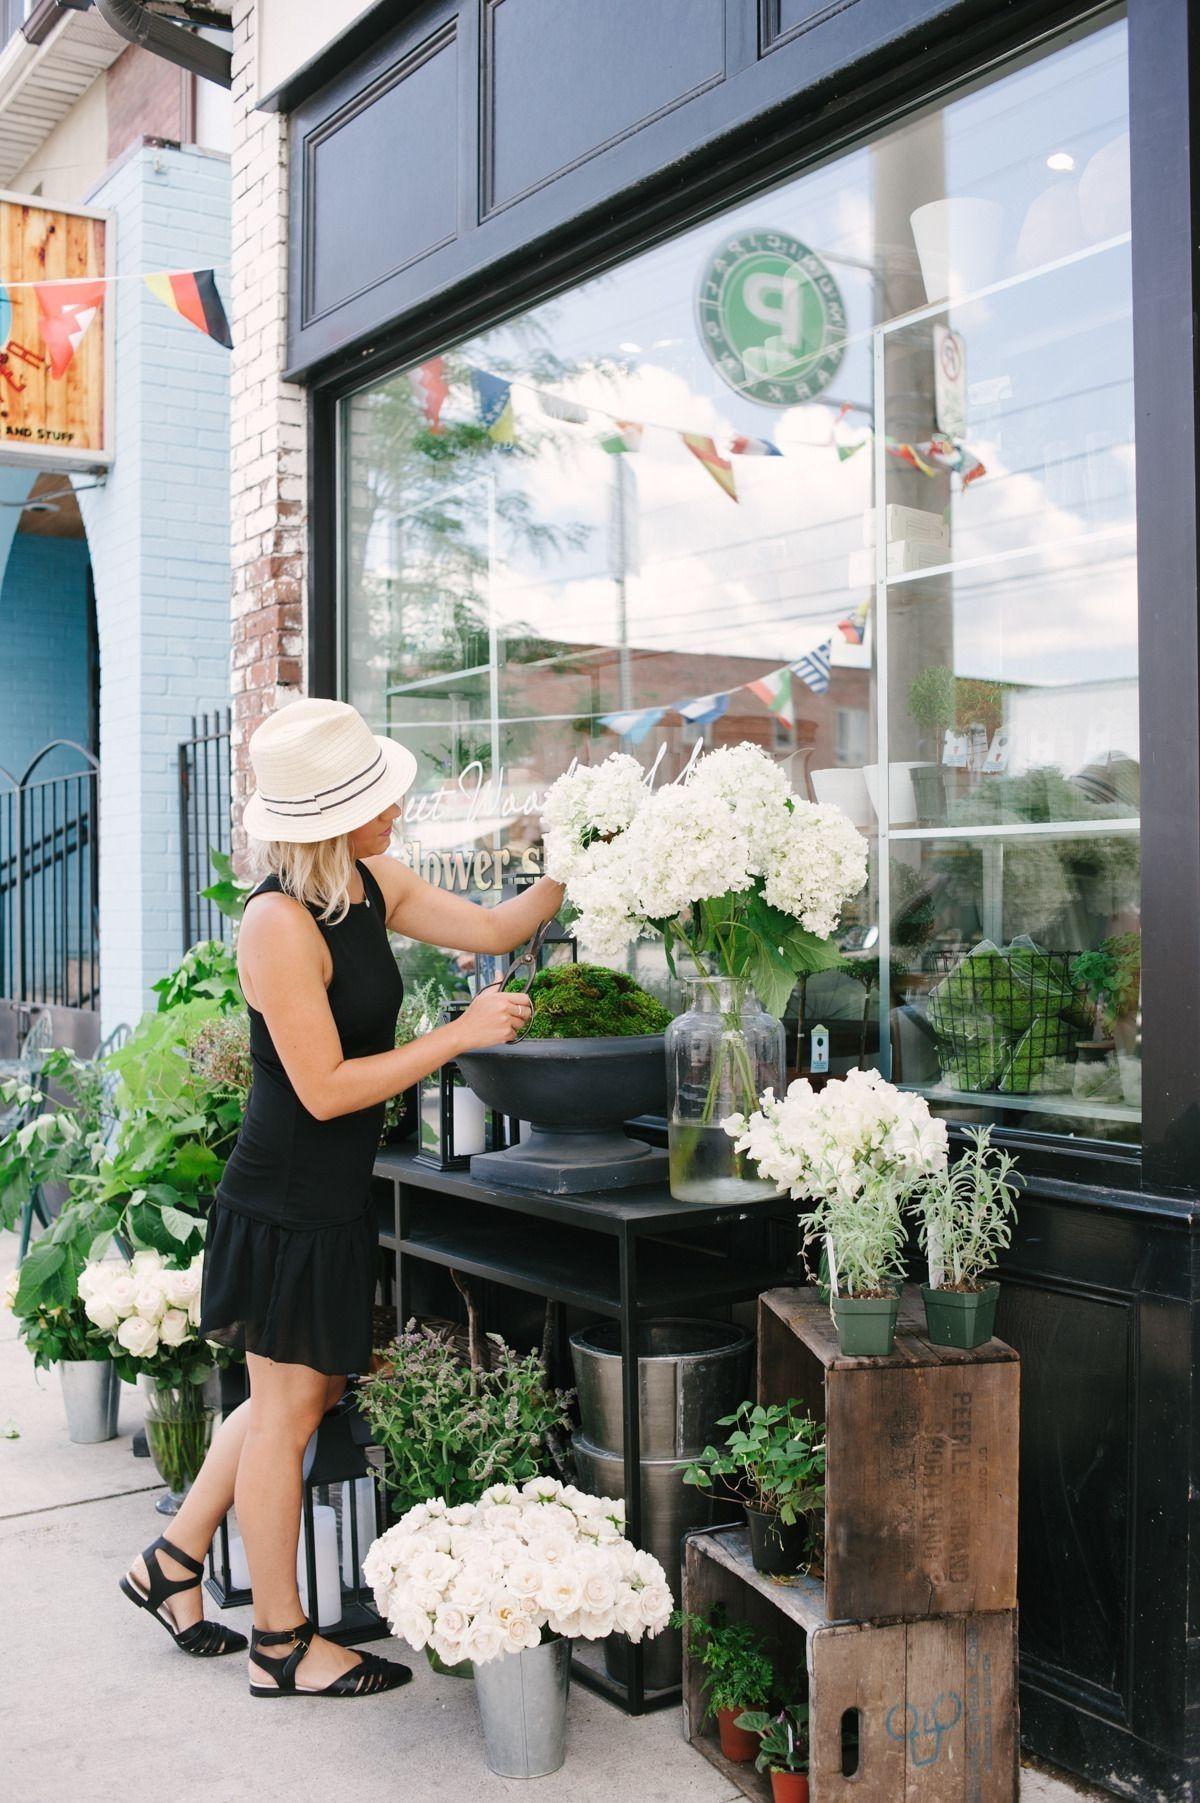 Pin By Elissa Blevins On My Flower Shoppe Pinterest Flower Shops